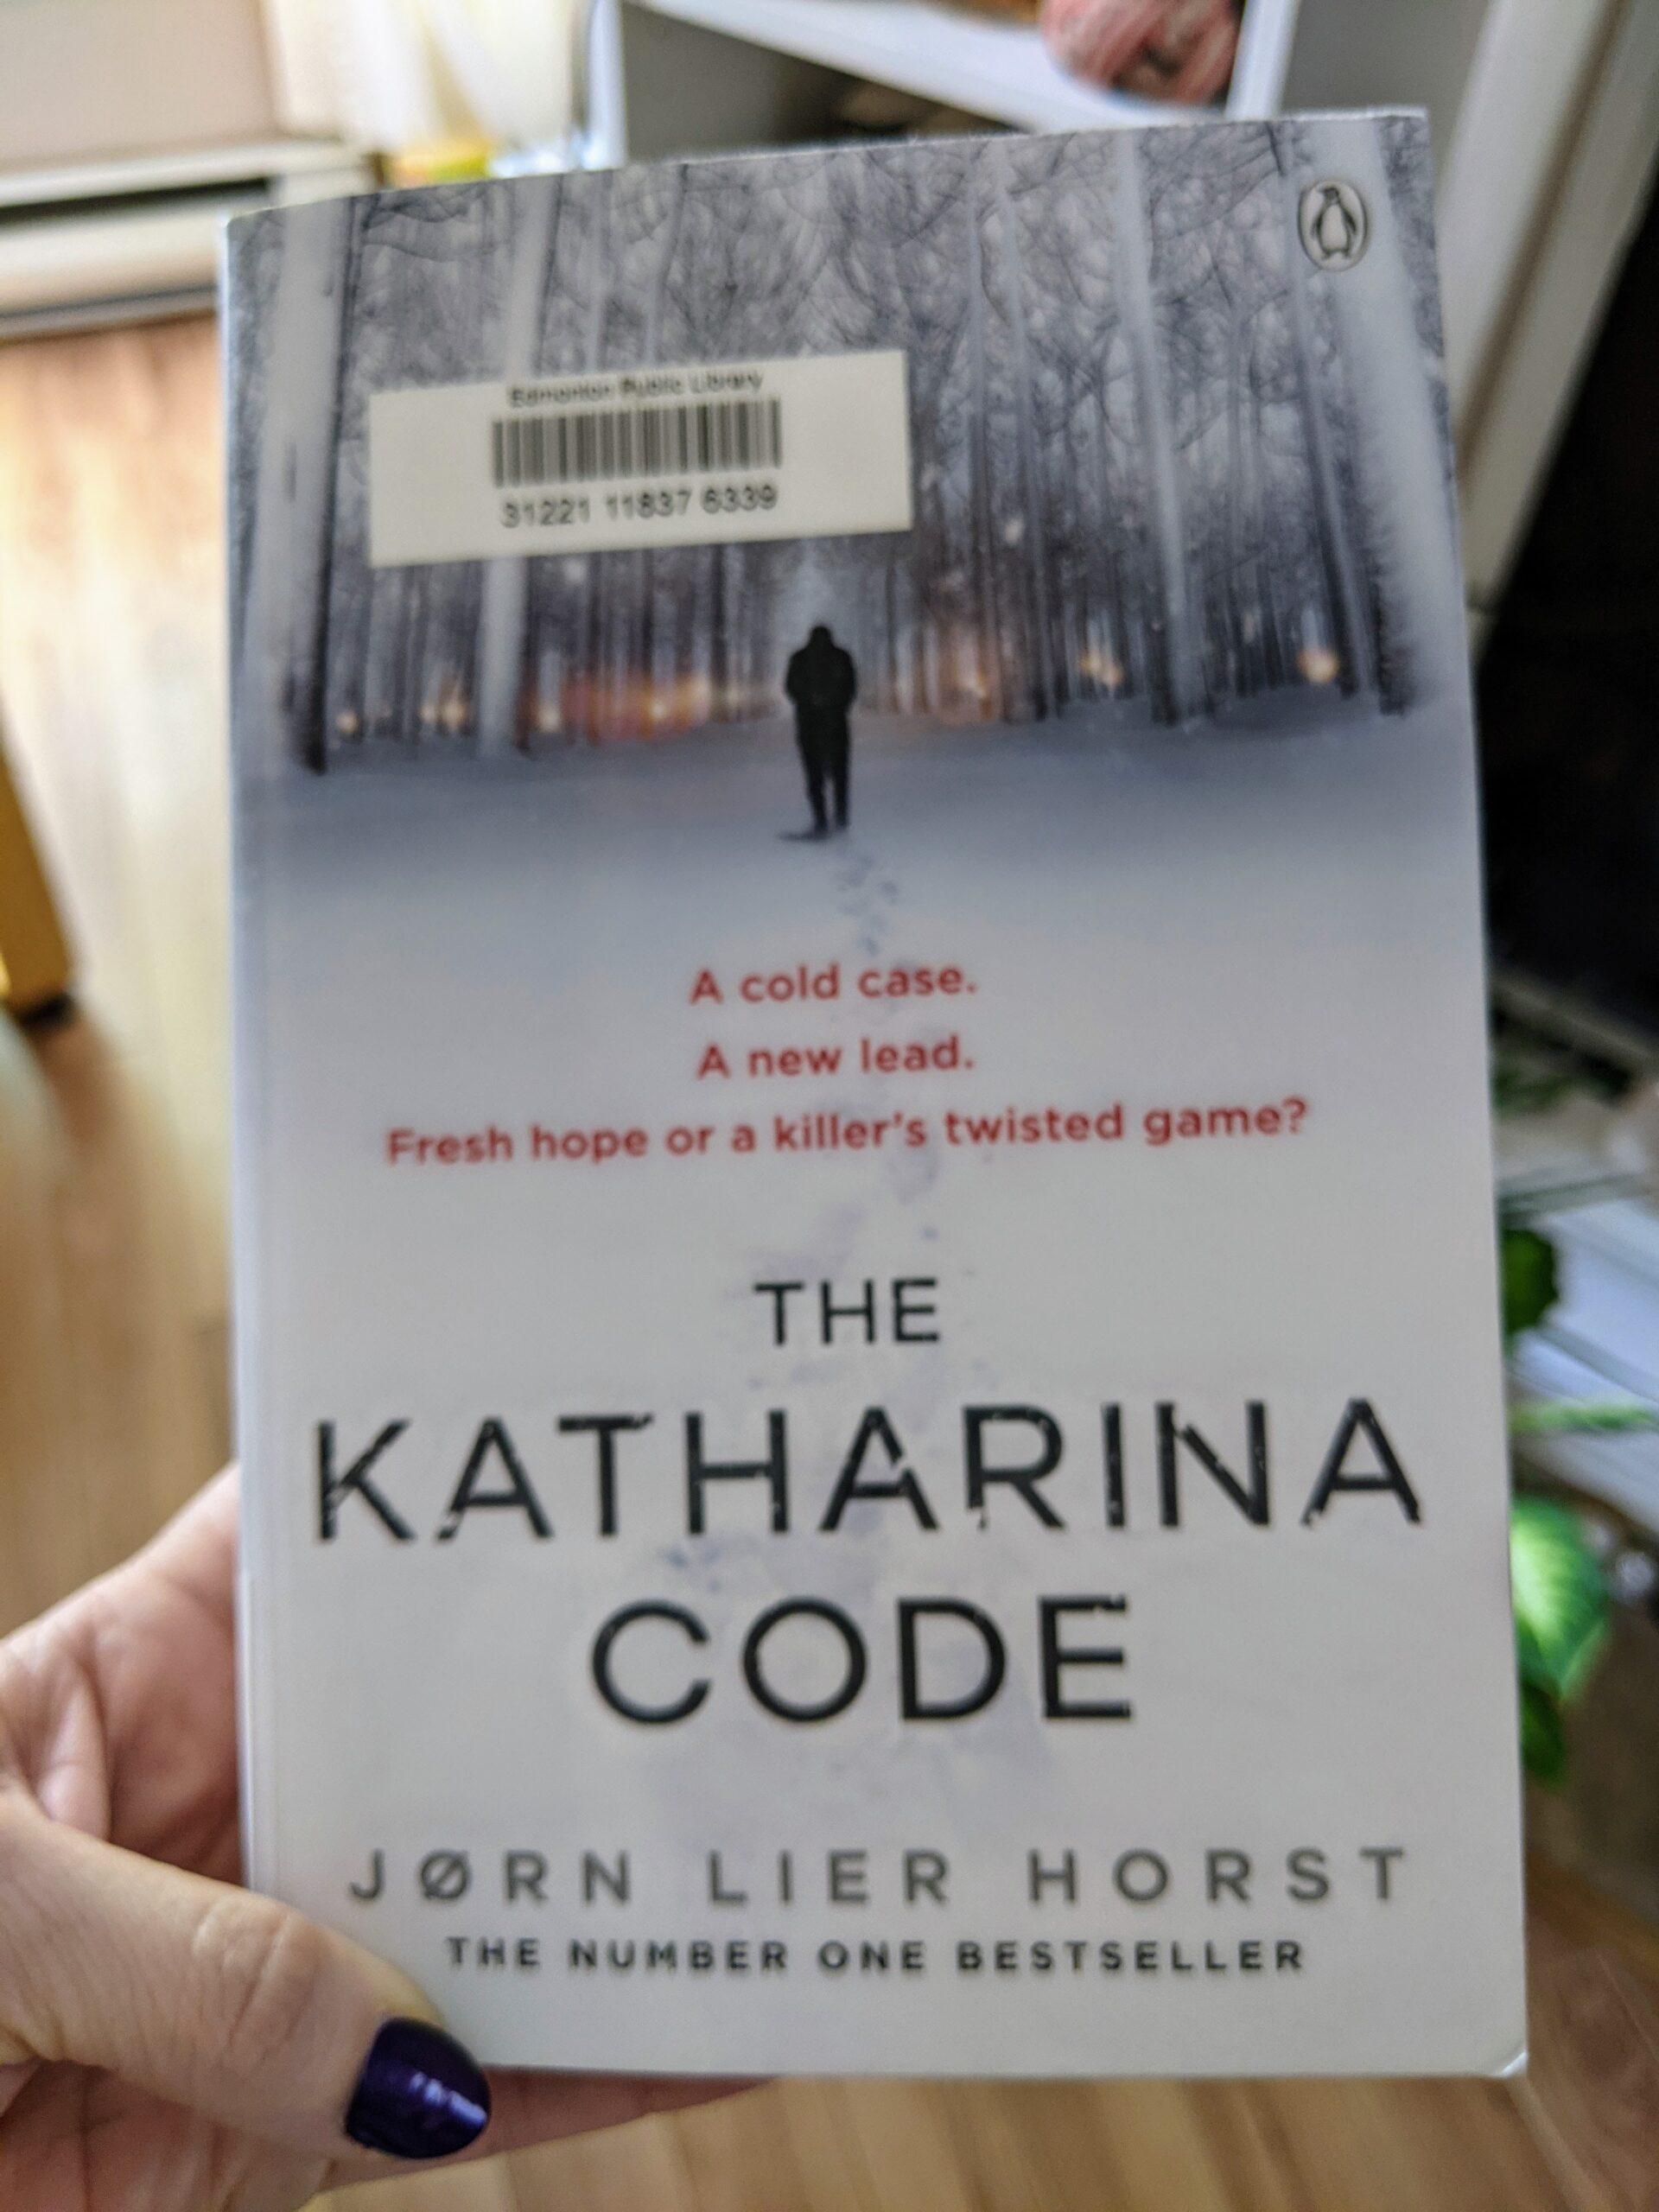 the katharina code